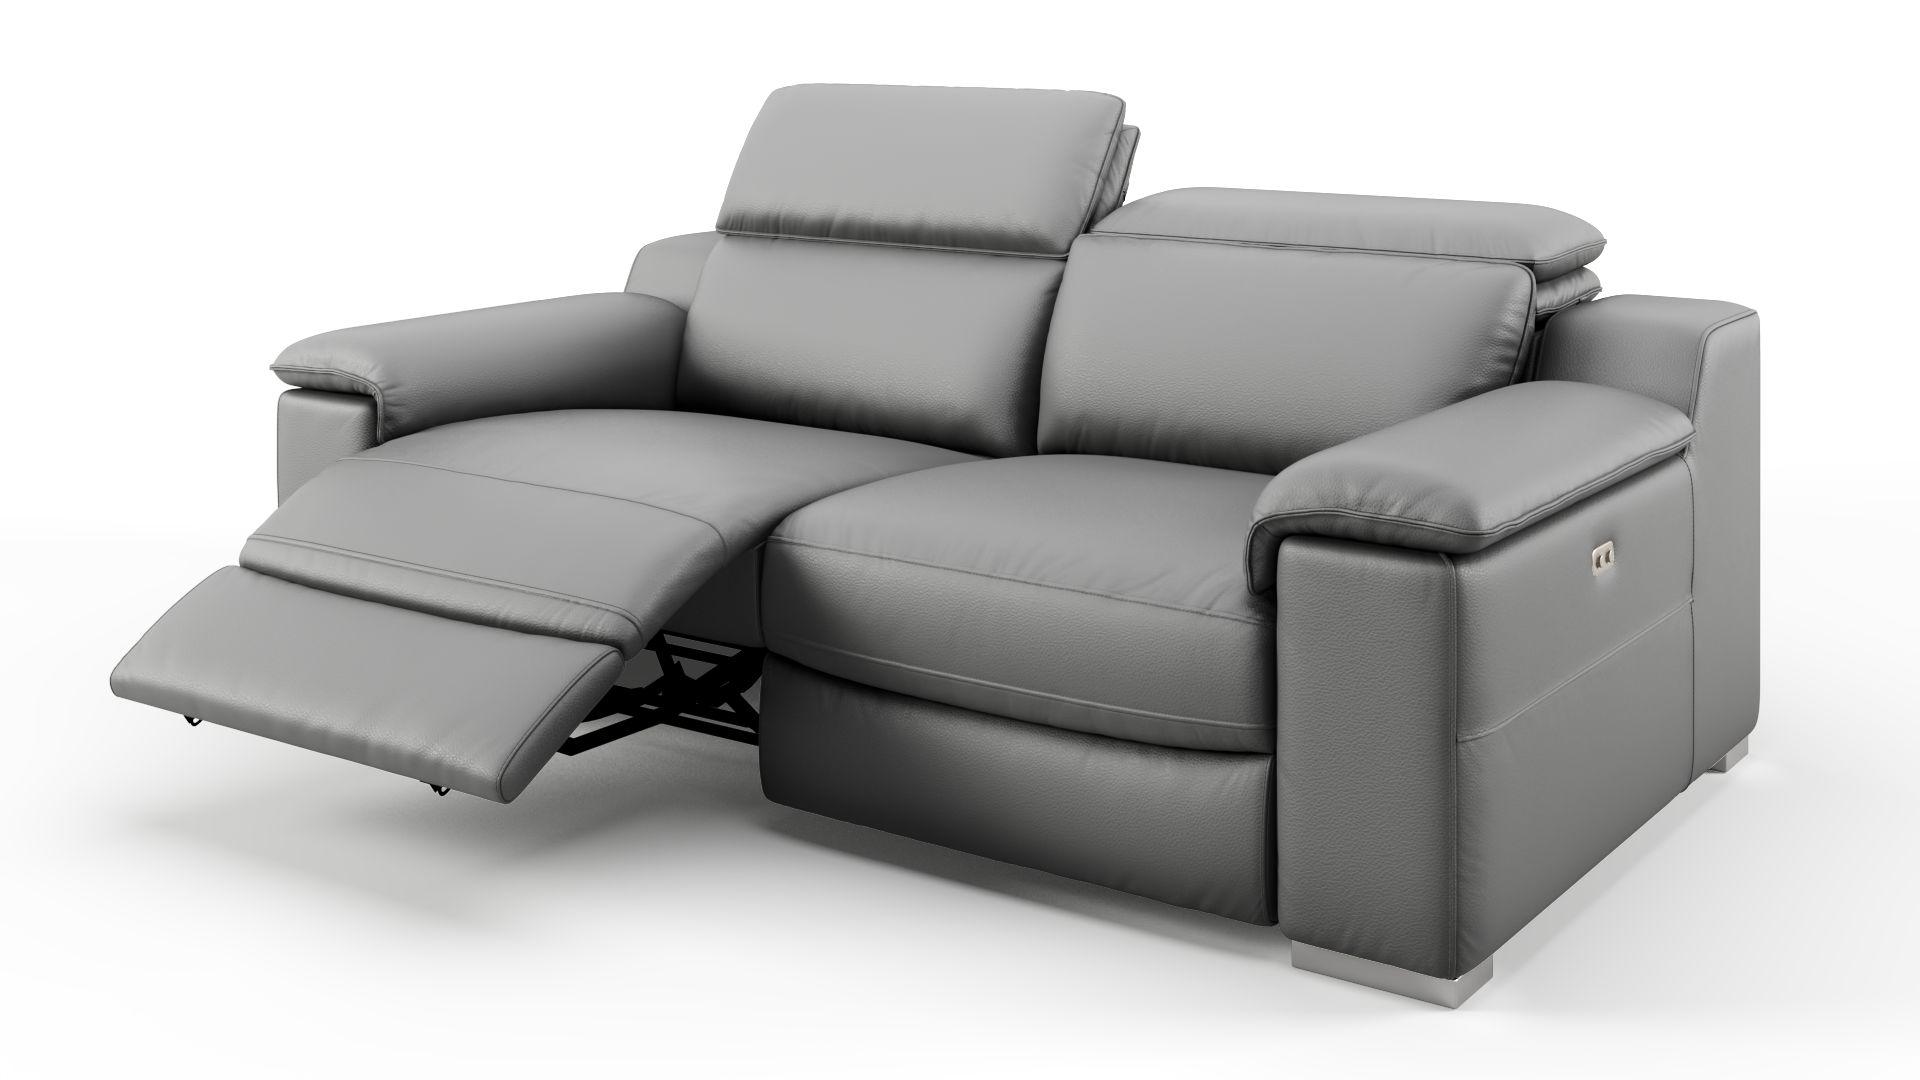 Full Size of Design Sofa 2 Sitzer Couch Mit Relaxfunktion Sofanella Rattan L Schlaffunktion Singleküche E Geräten Mondo Alternatives Küche U Form Theke 2er Grau Big Xxl Sofa Sofa Mit Relaxfunktion